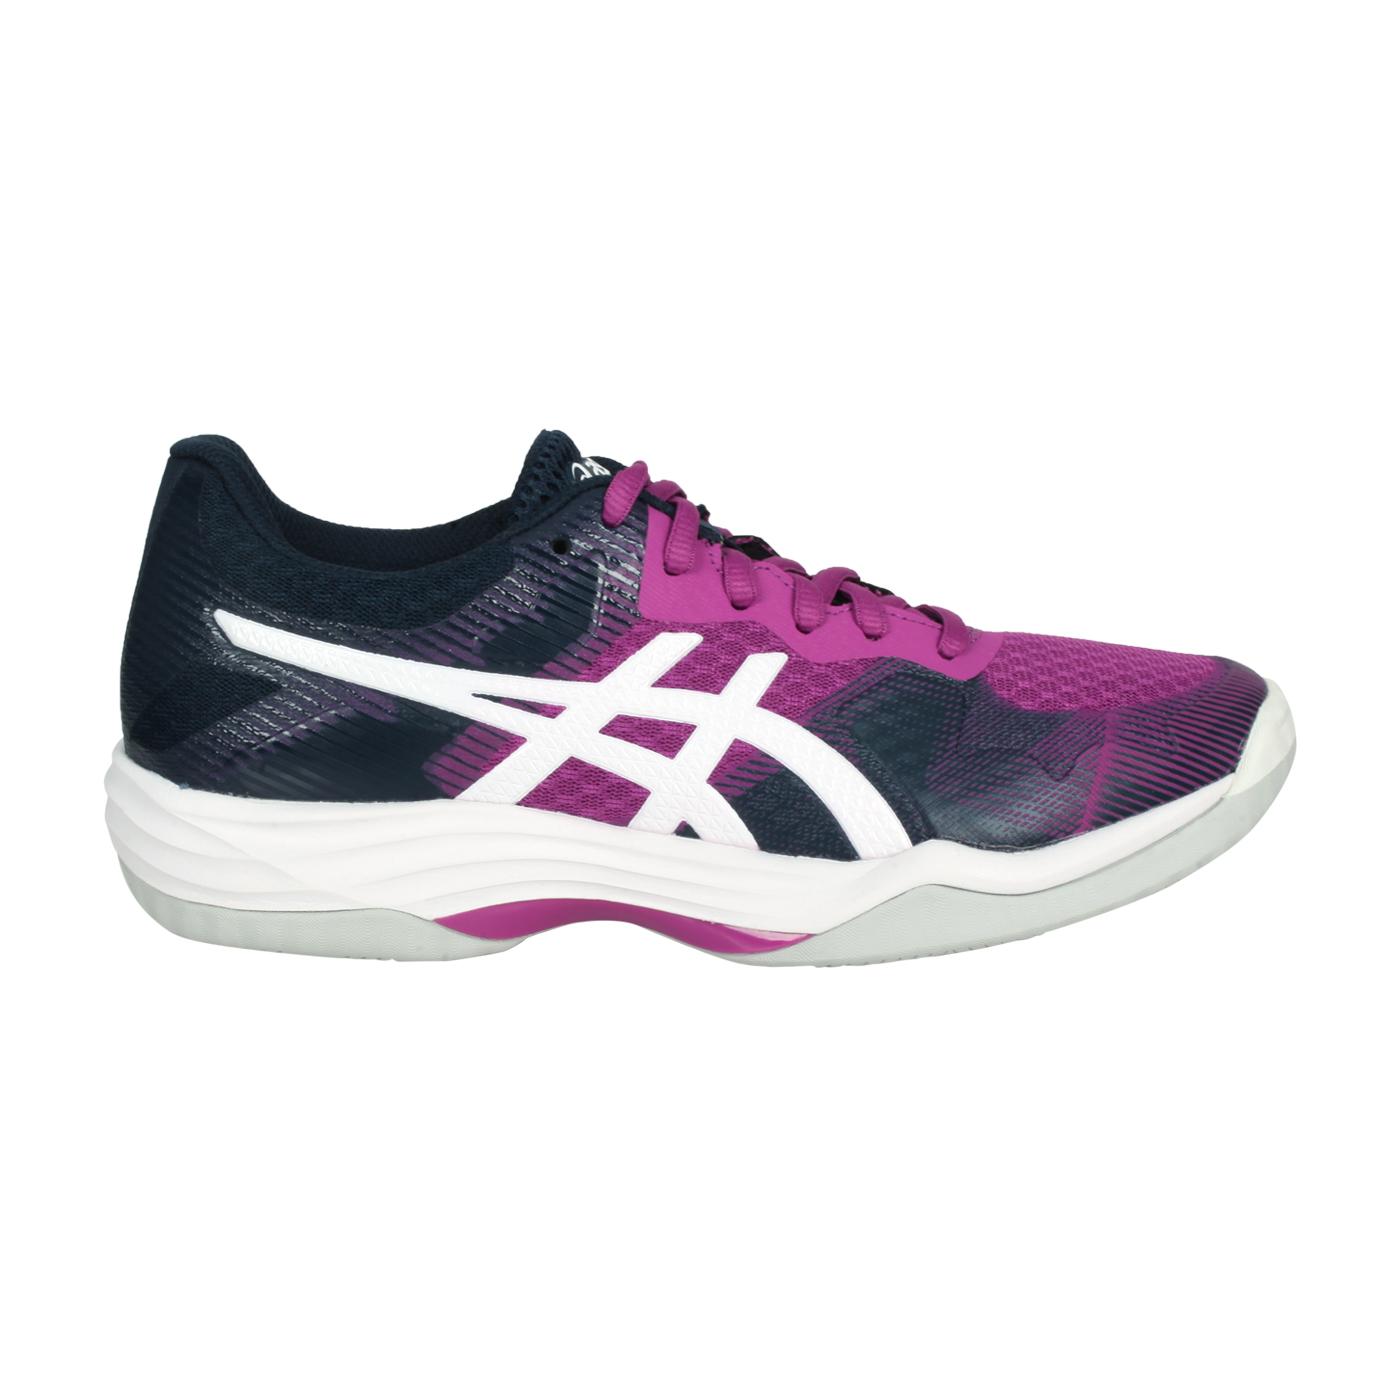 ASICS 女款排羽球鞋  @GEL-TACTIC@1072A035-501